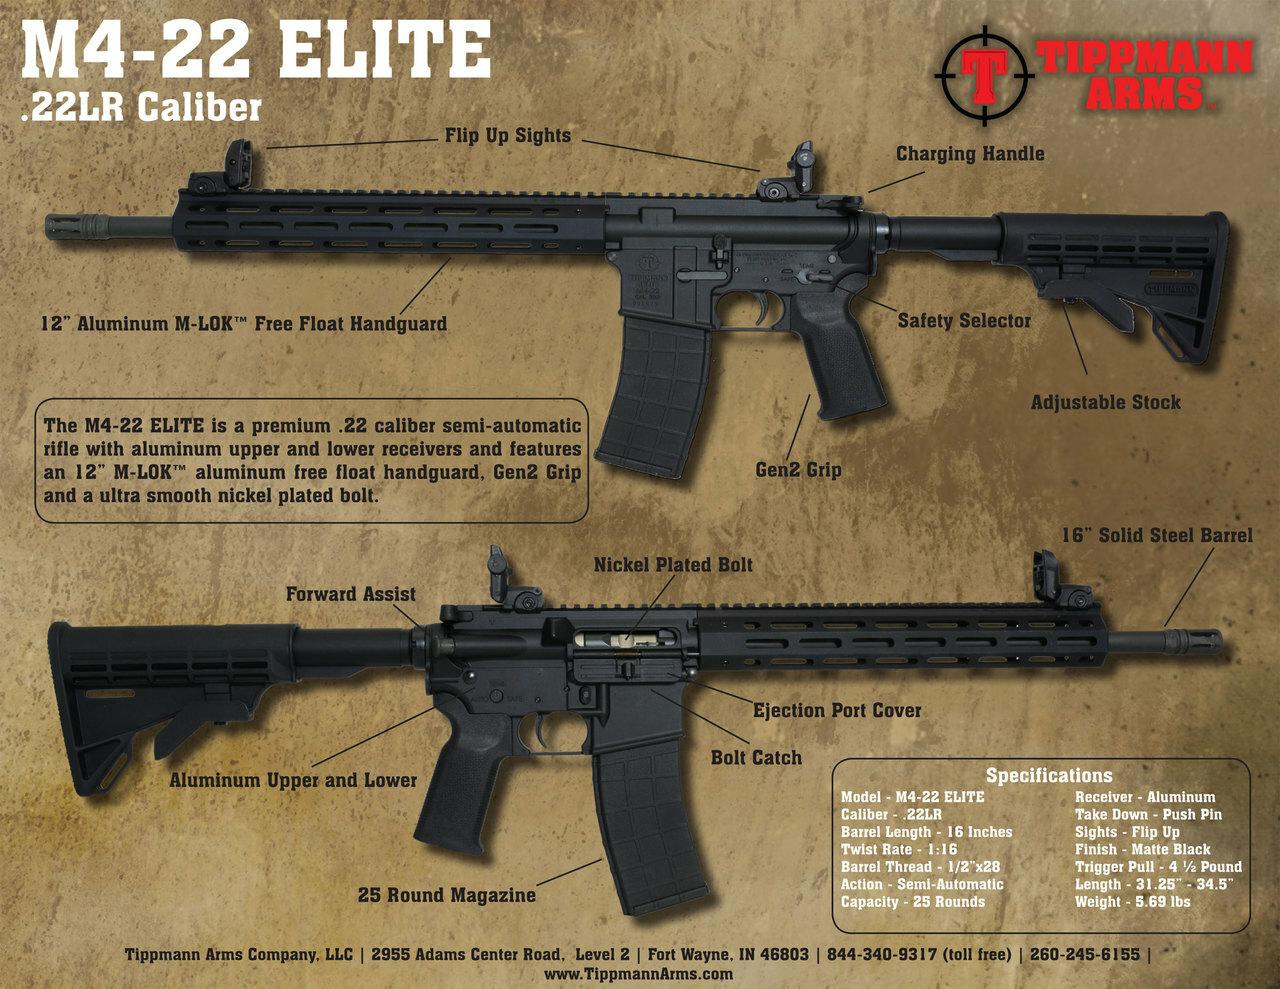 M4-22-ELITE-Spec-Sheet-76318-33226-1596138023